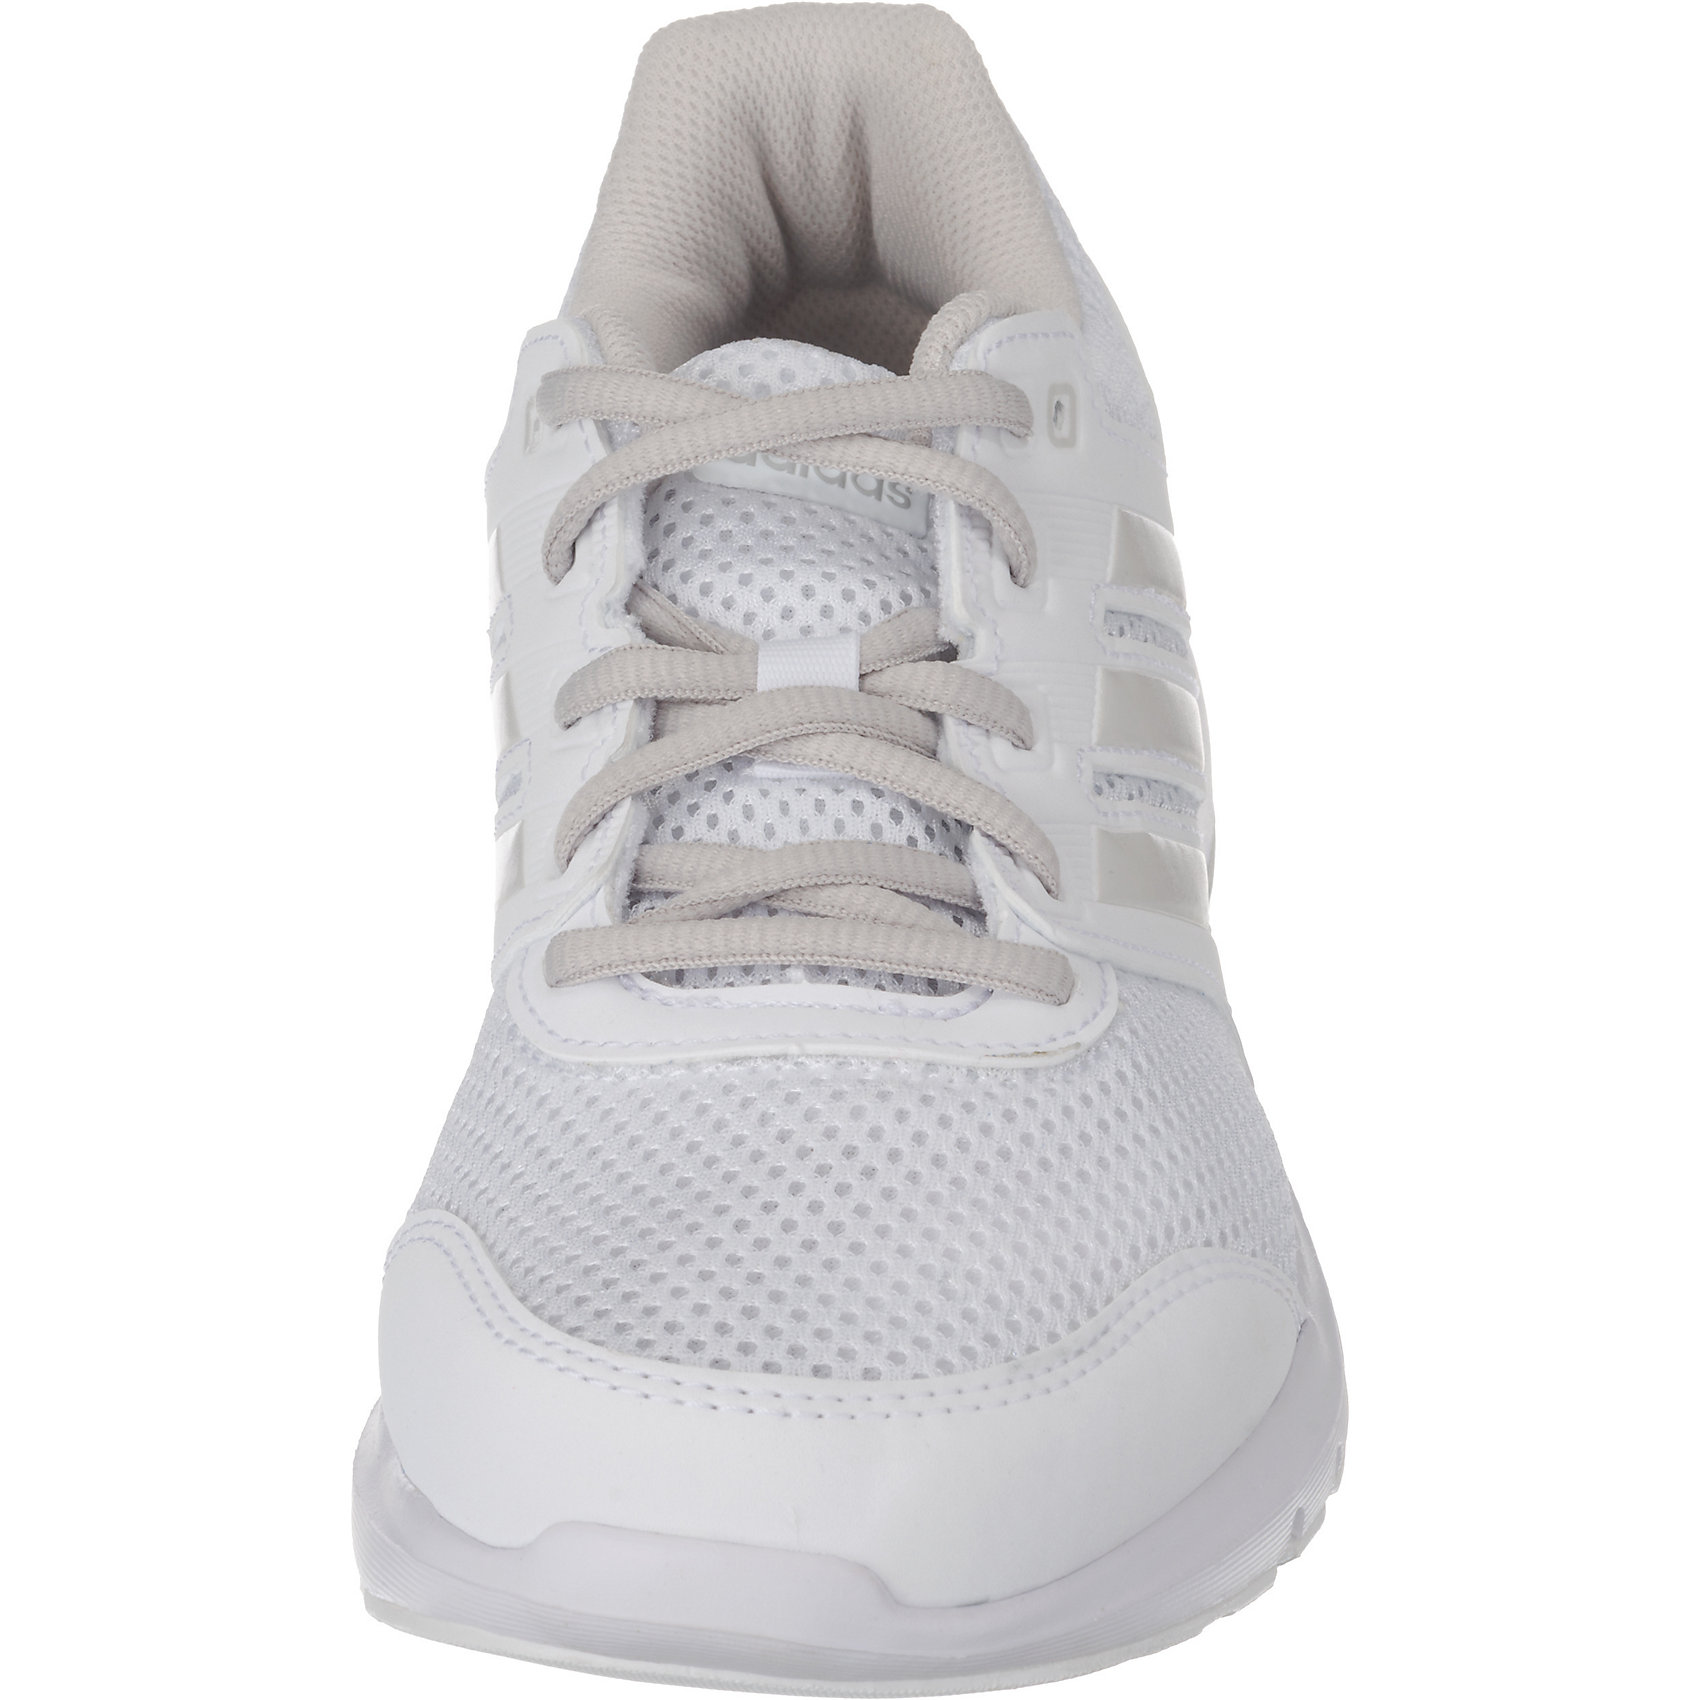 Neu adidas Performance DURAMO LITE 2.0 Laufschuhe 8396927 für Damen Damen Damen 0f9229